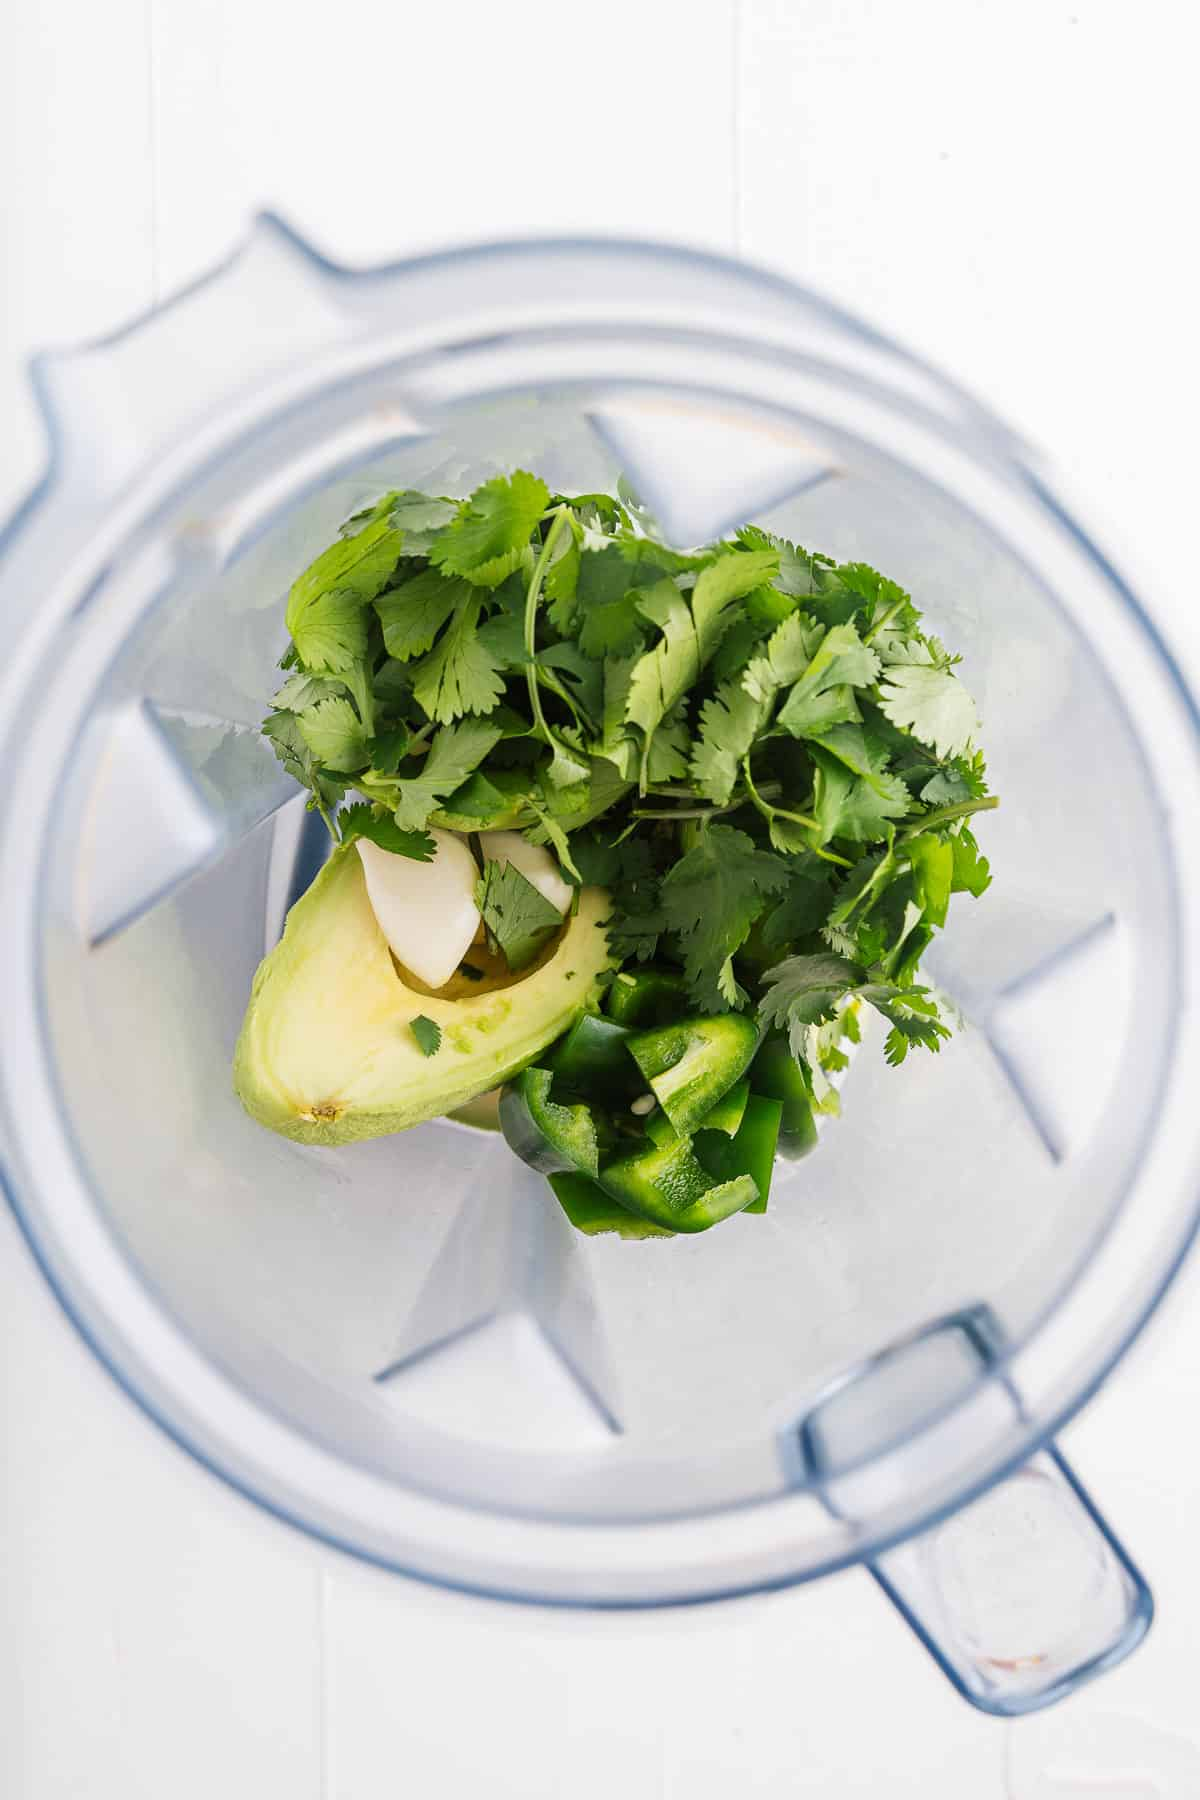 Avocado, Cilantro, Jalapeño, Lime, and Garlic in a Blender